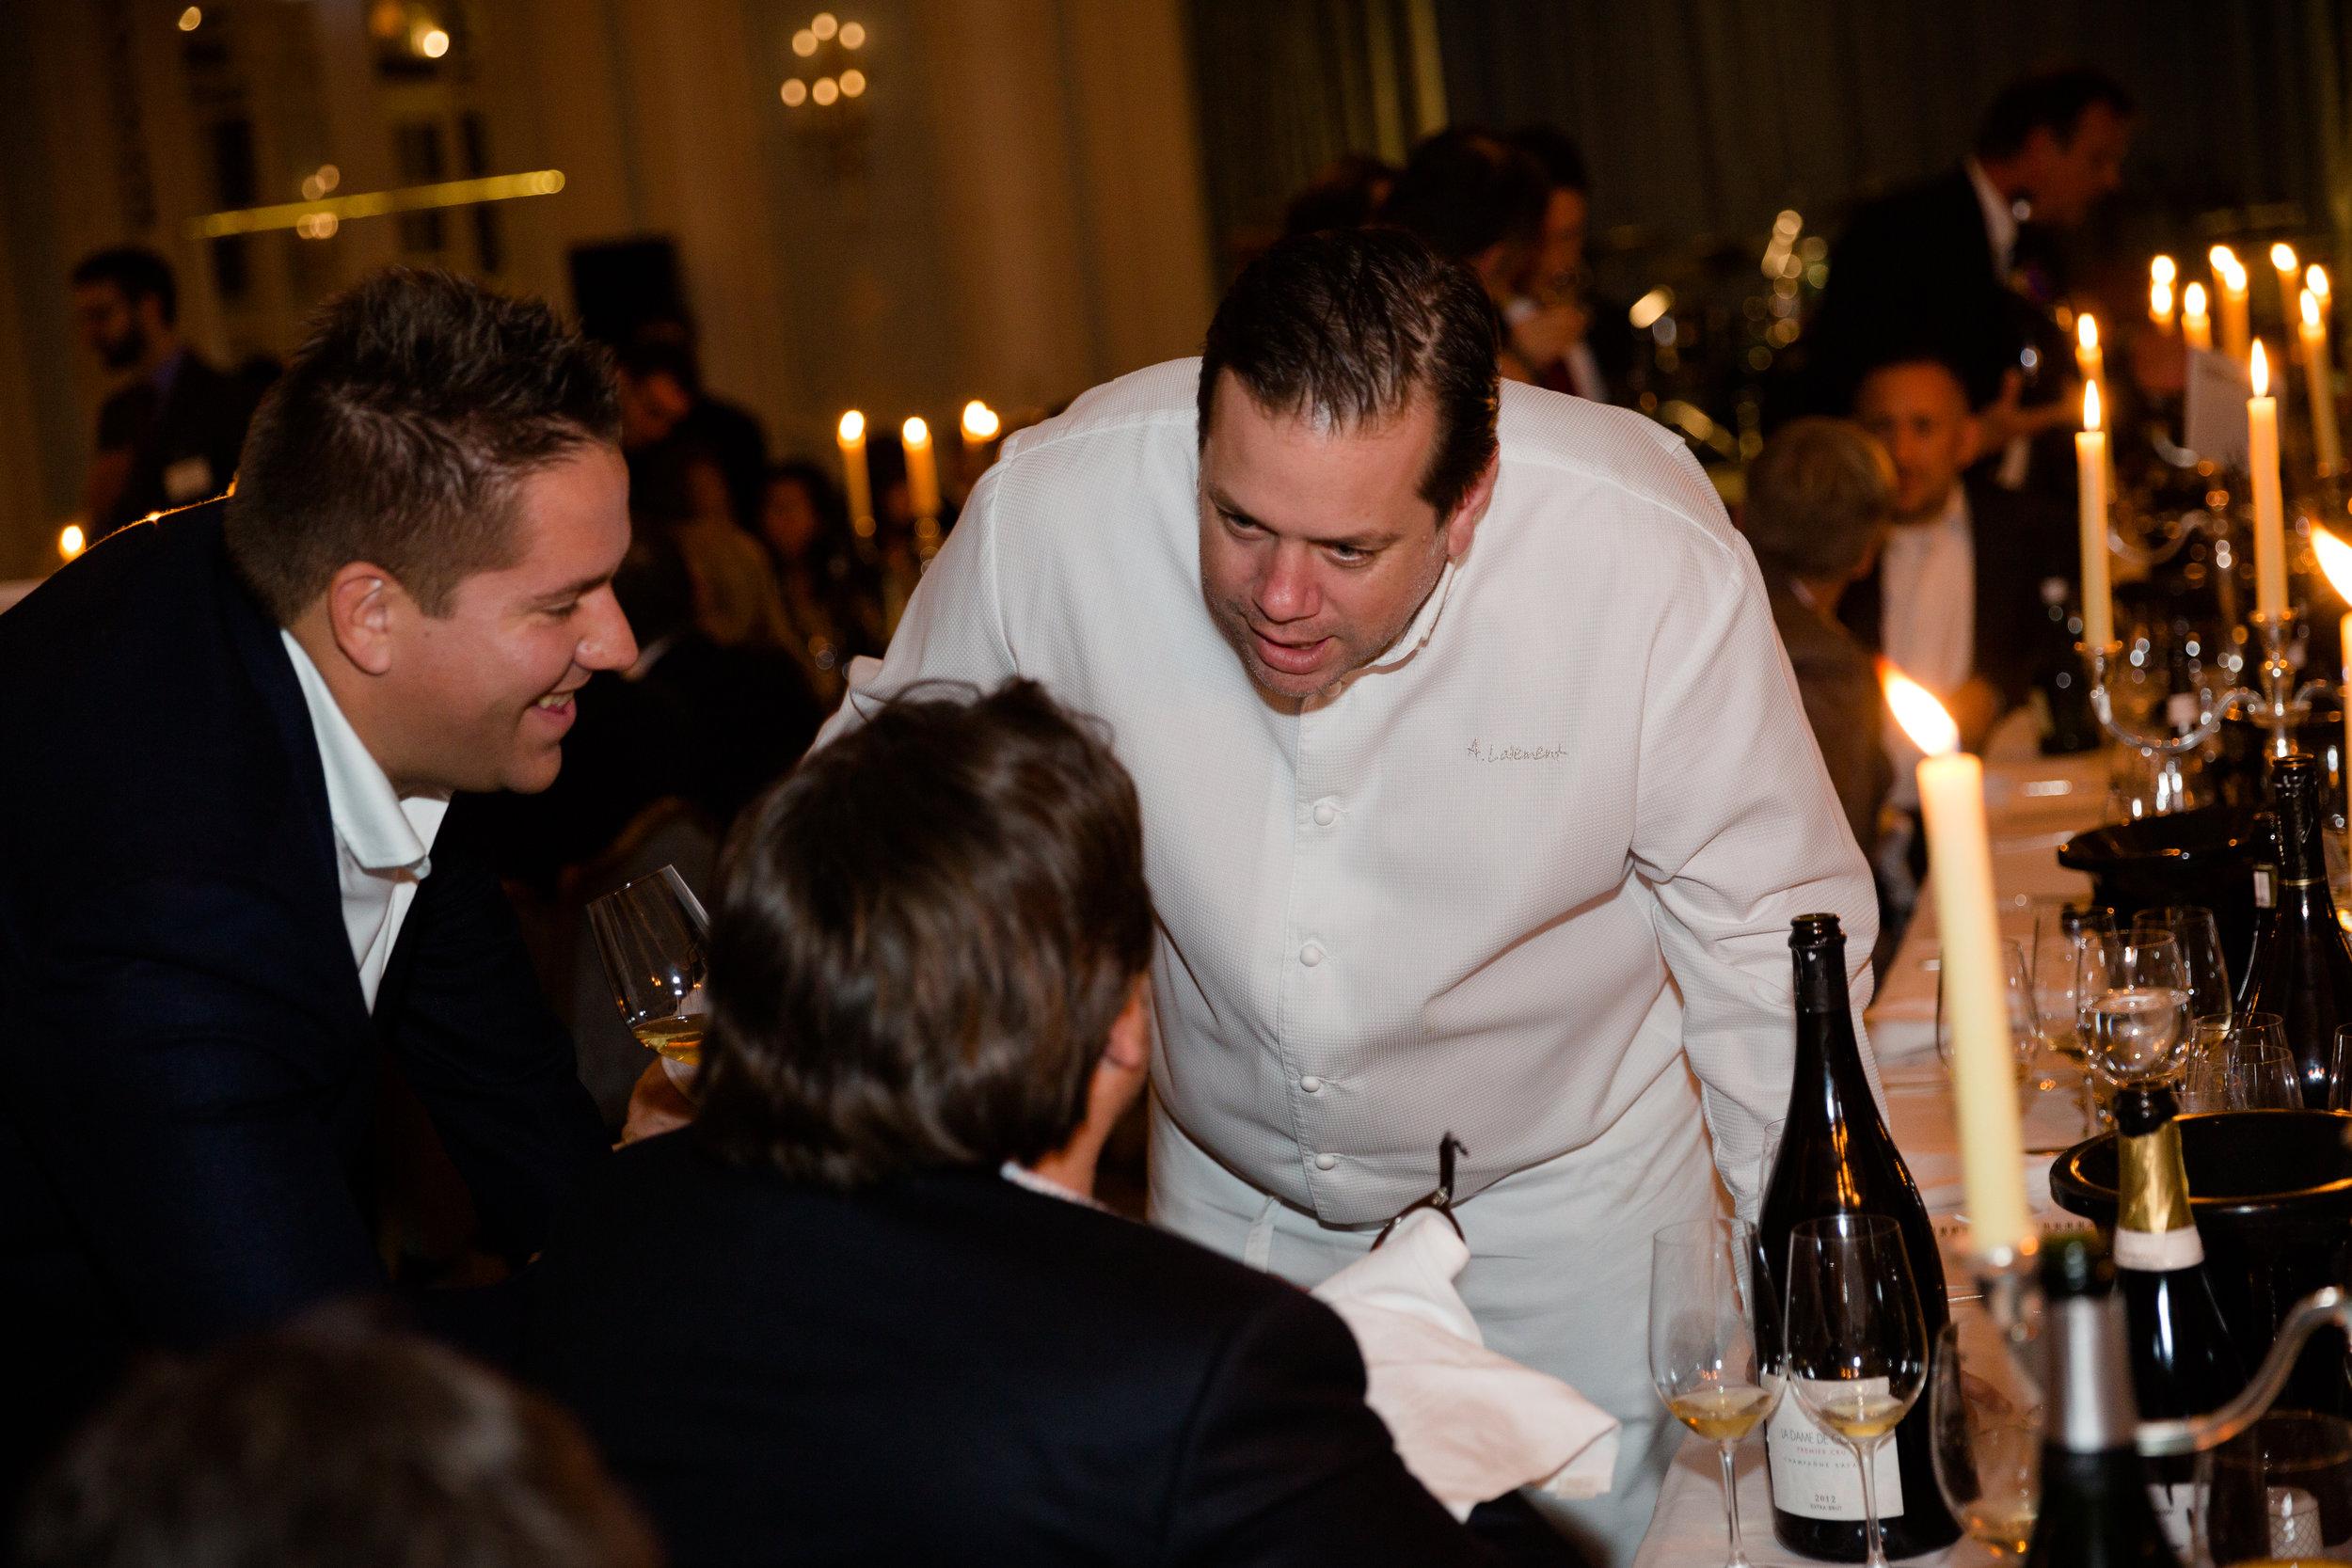 Copy of Le Fete 2nd Dinner Event Nov 2017-230.jpg